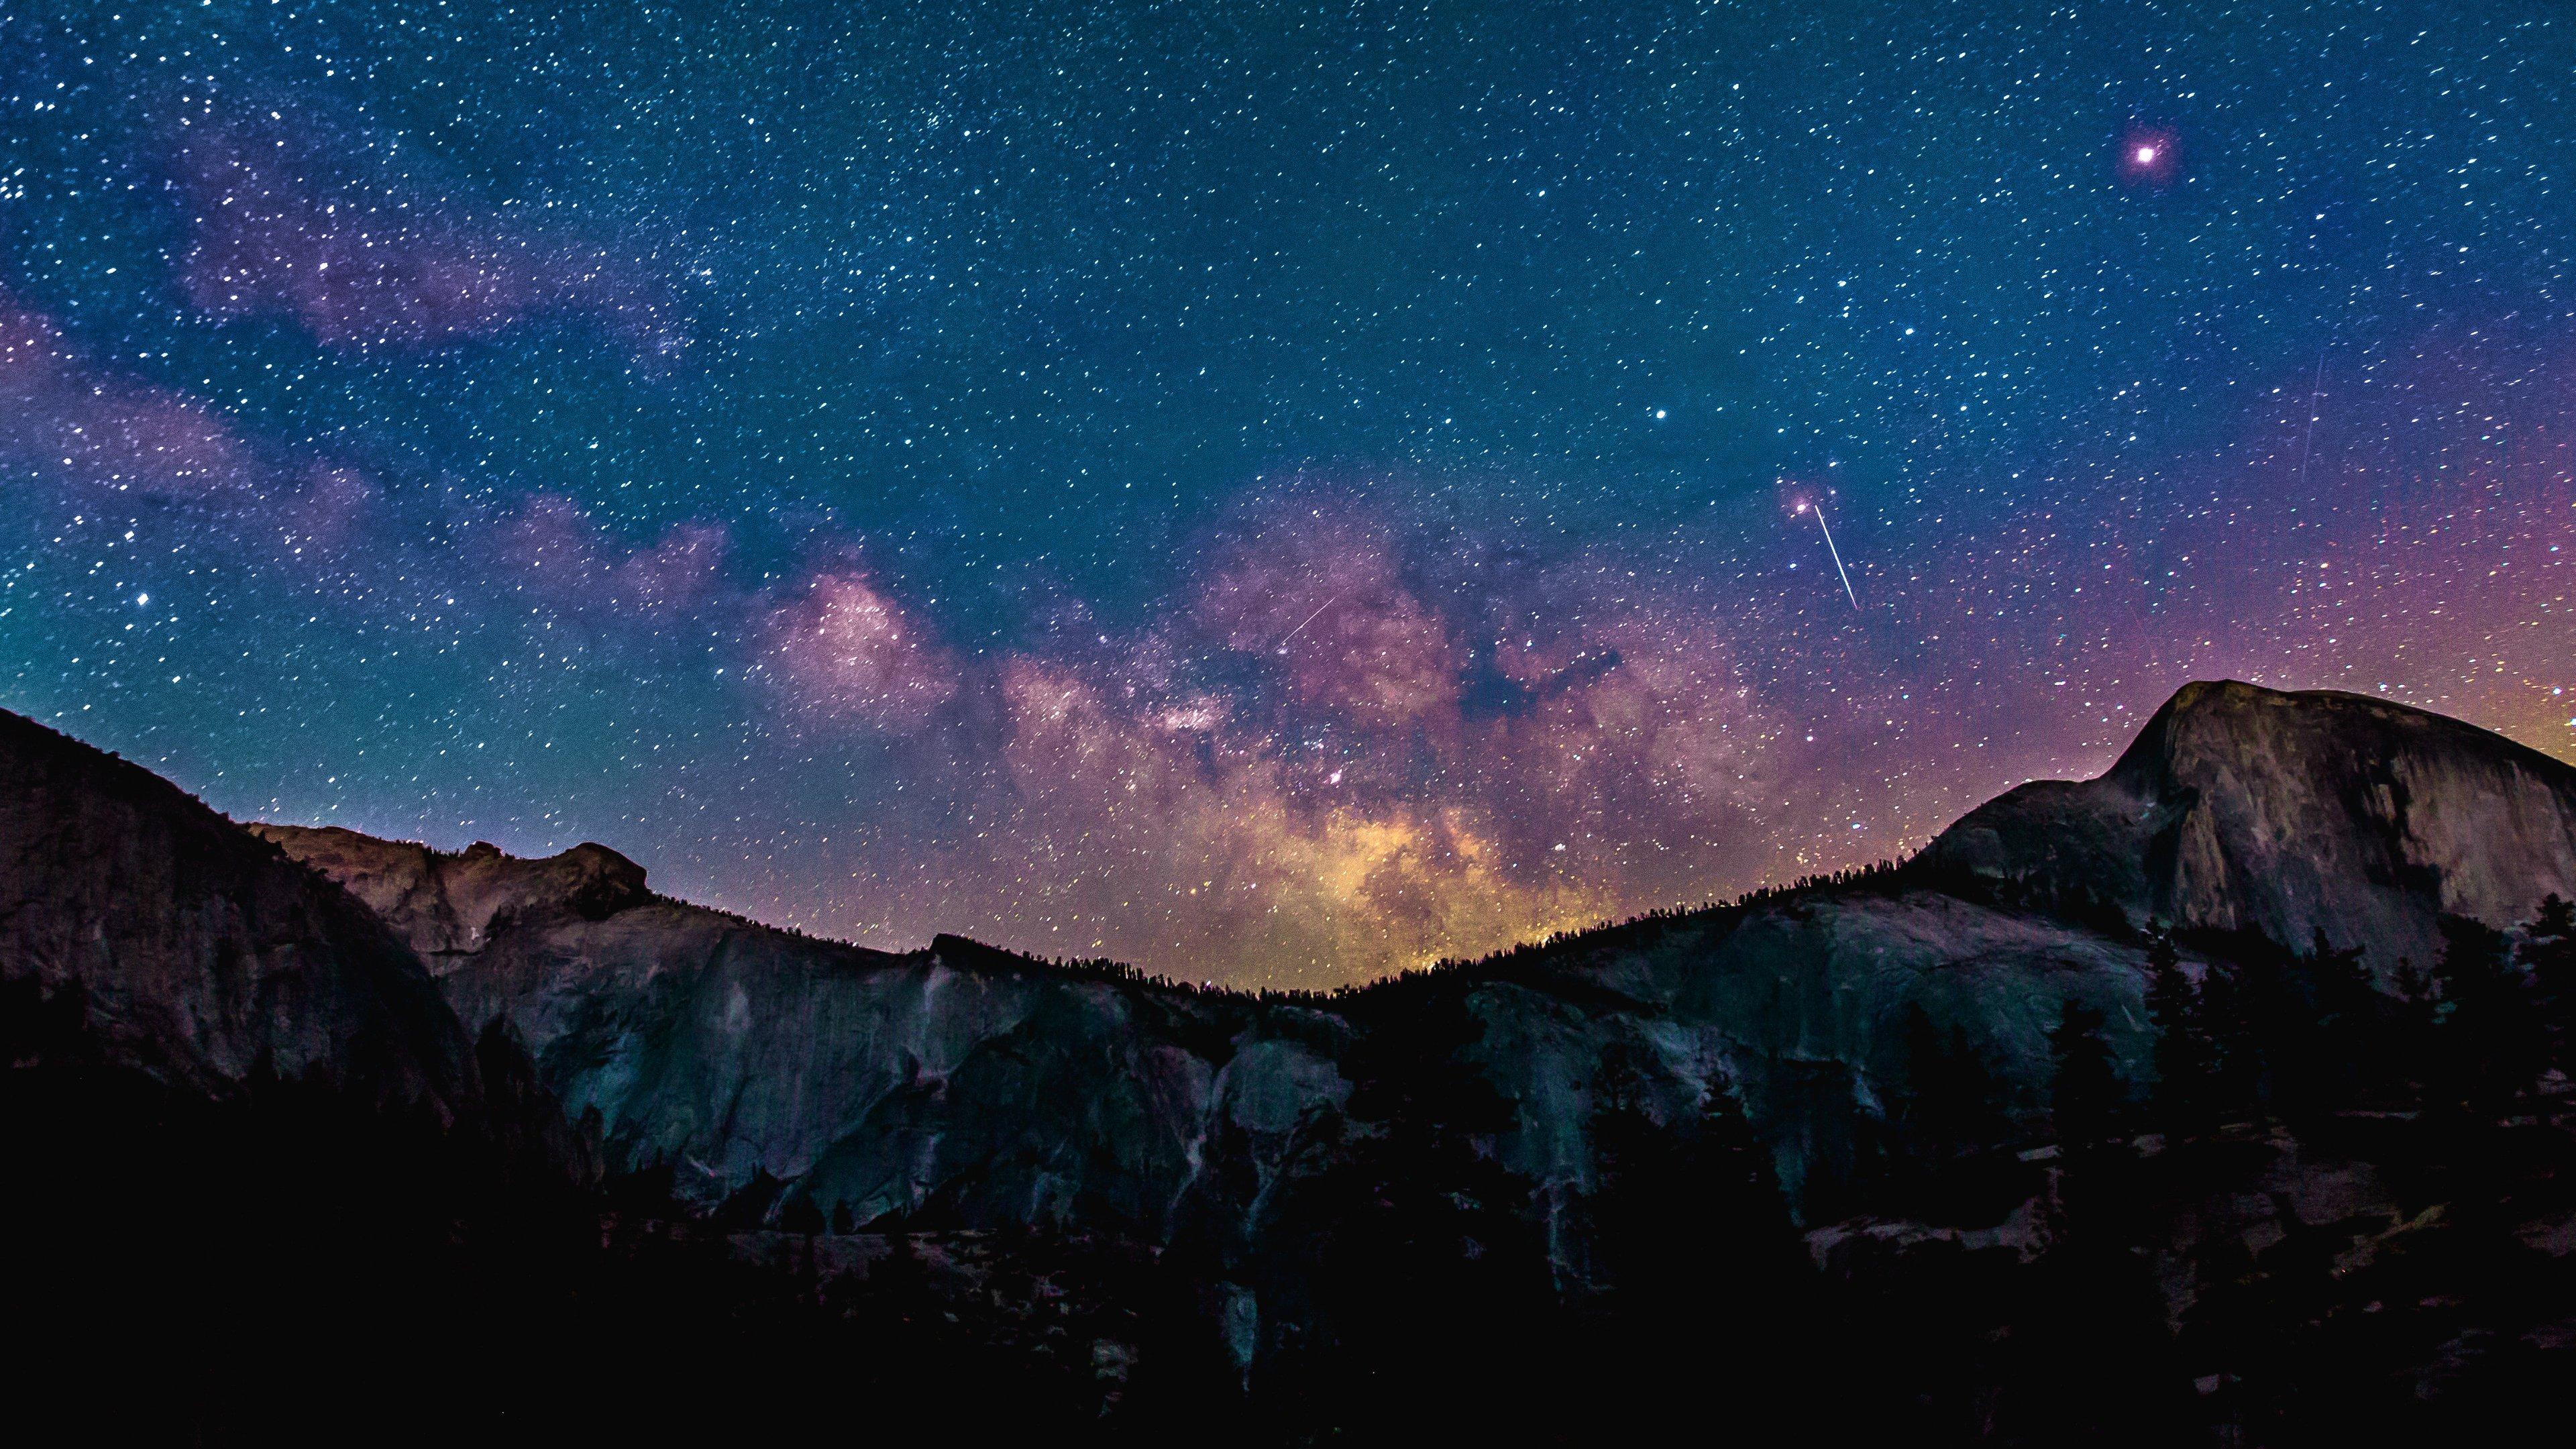 Milky Way Over Mountains Wallpaper Mobile Desktop Background